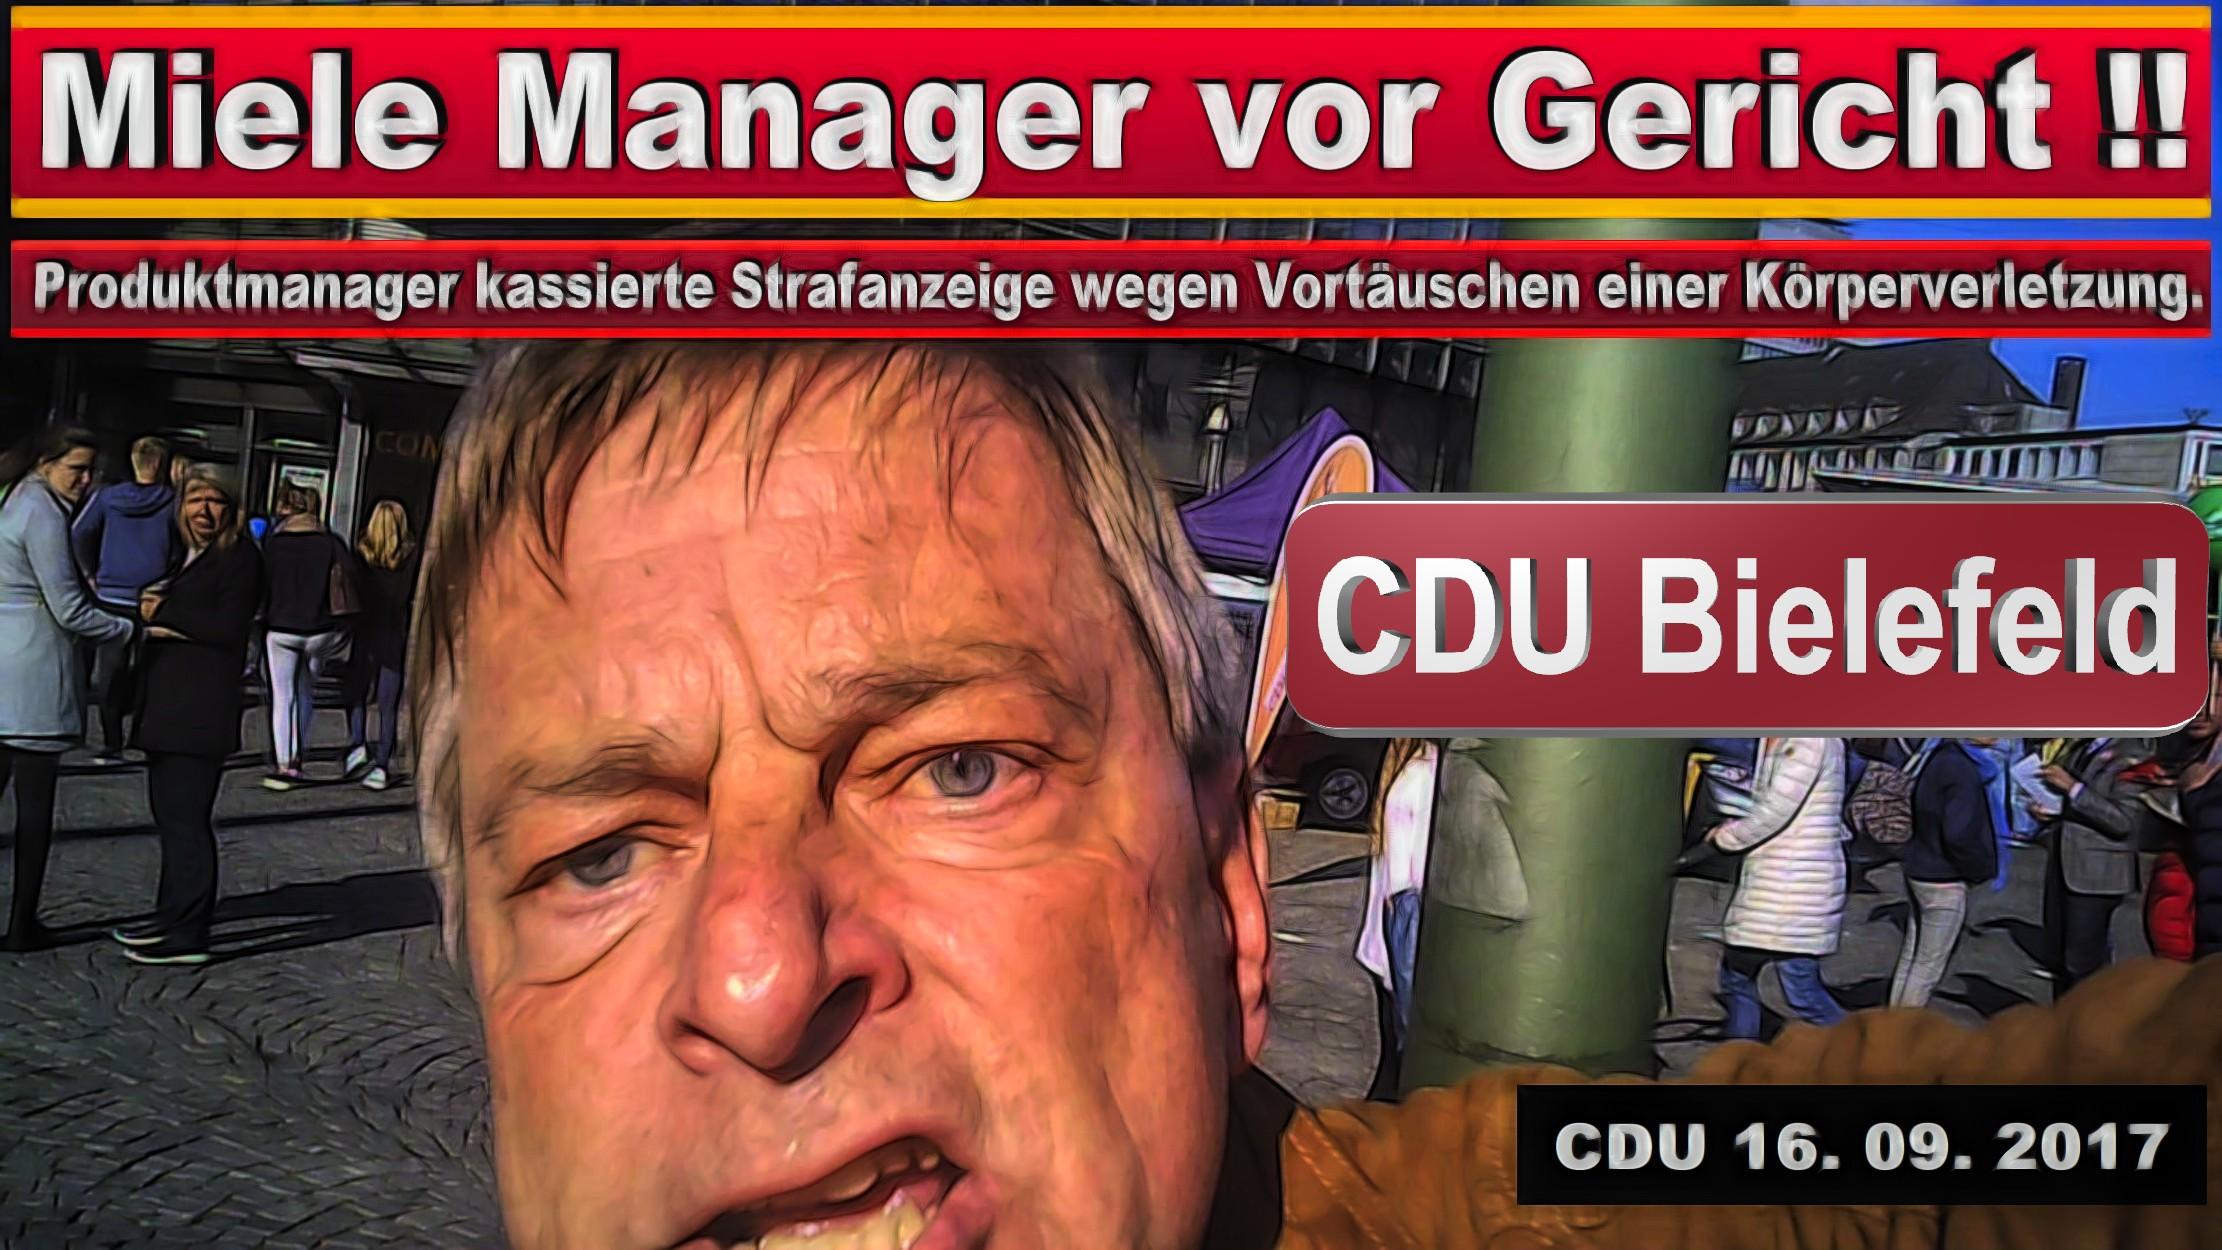 CDU PARTEITAG 2018 BIELEFELD MICHAEL WEBER MIELE GüTERSLOH PRODUKTMANAGER JURIST SPD FDP AFD BIELEFELD